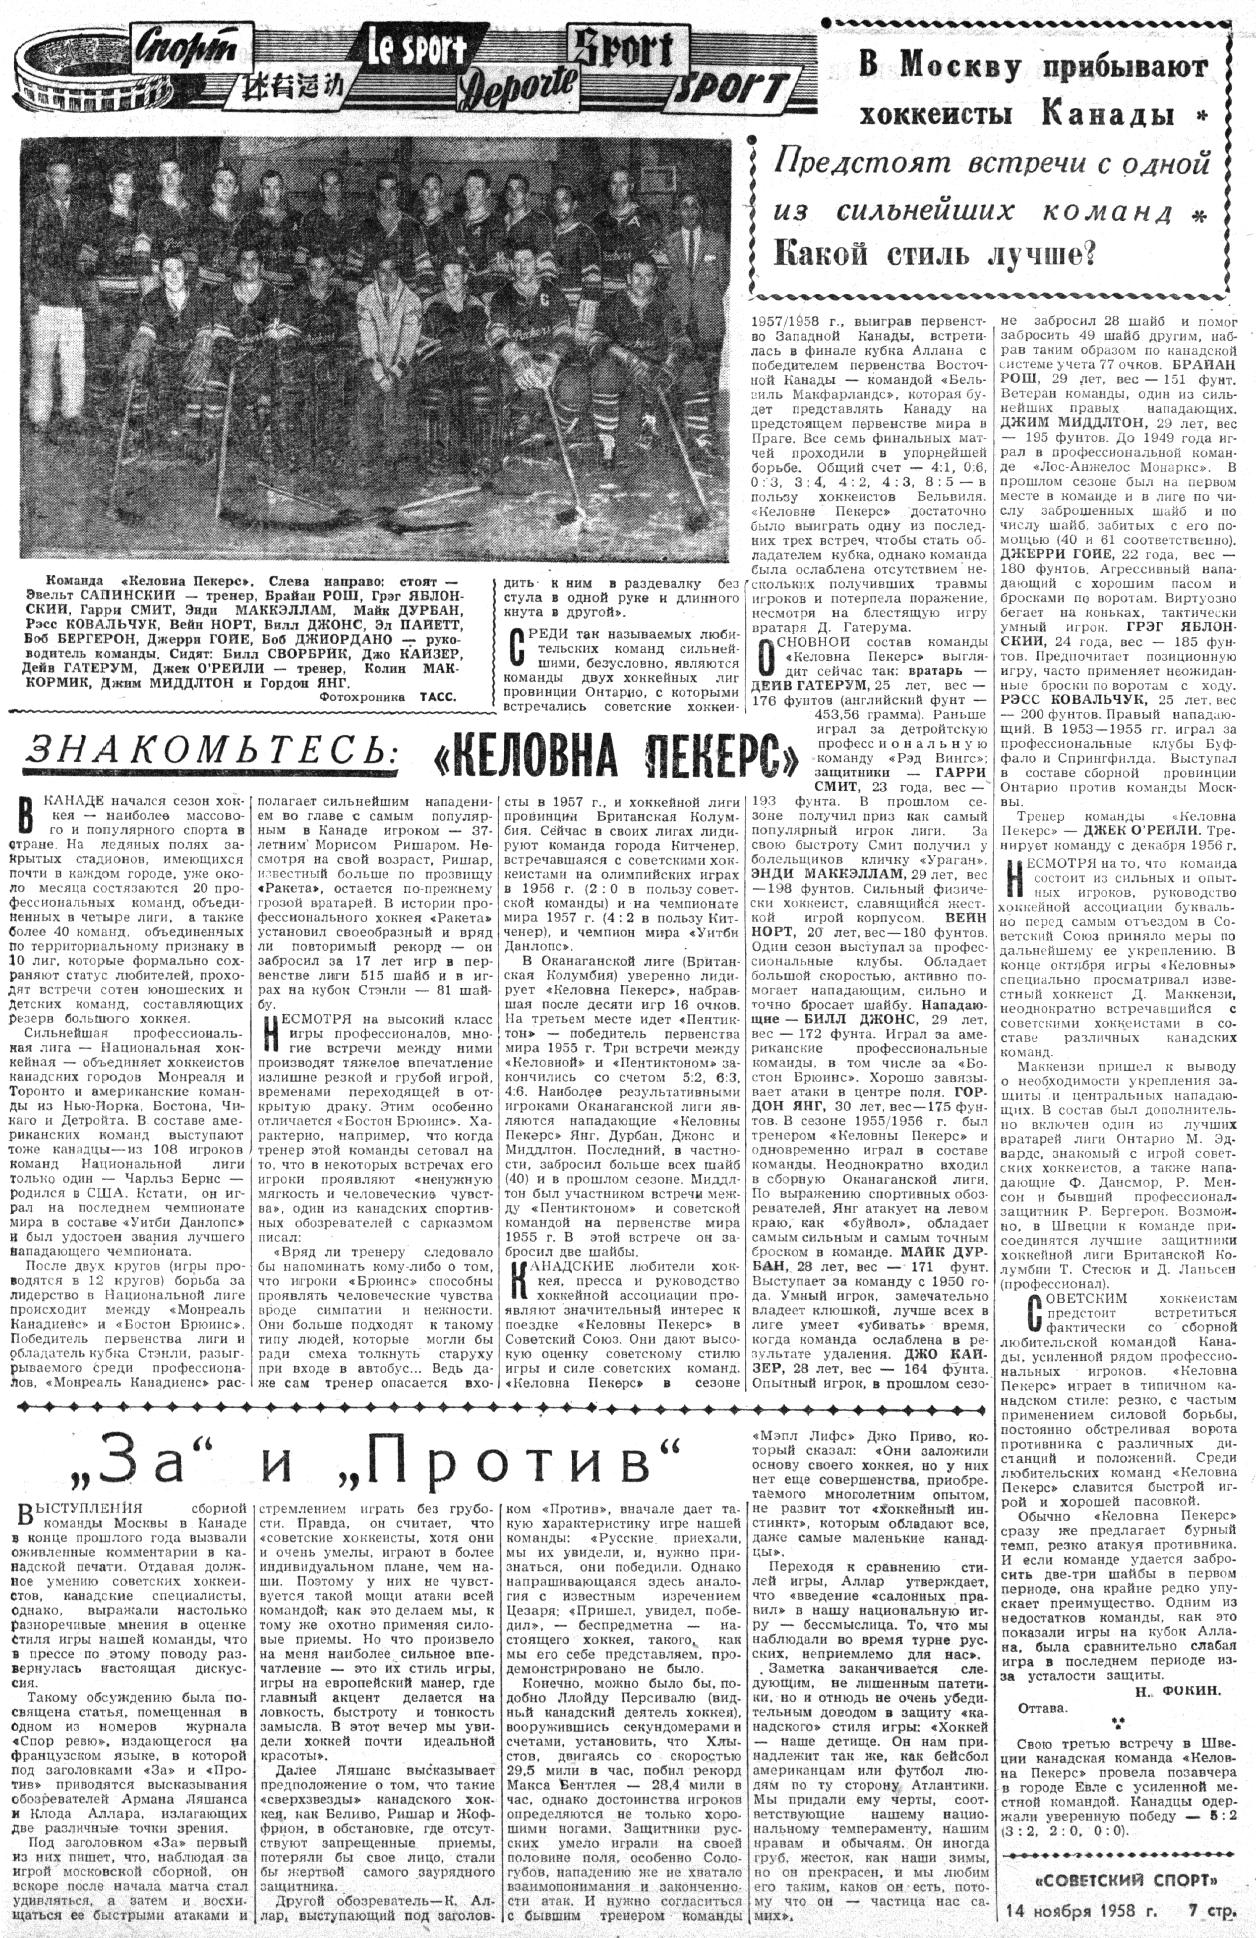 Sovetskiy_Sport_1958_11_14_N268_s7.JPG